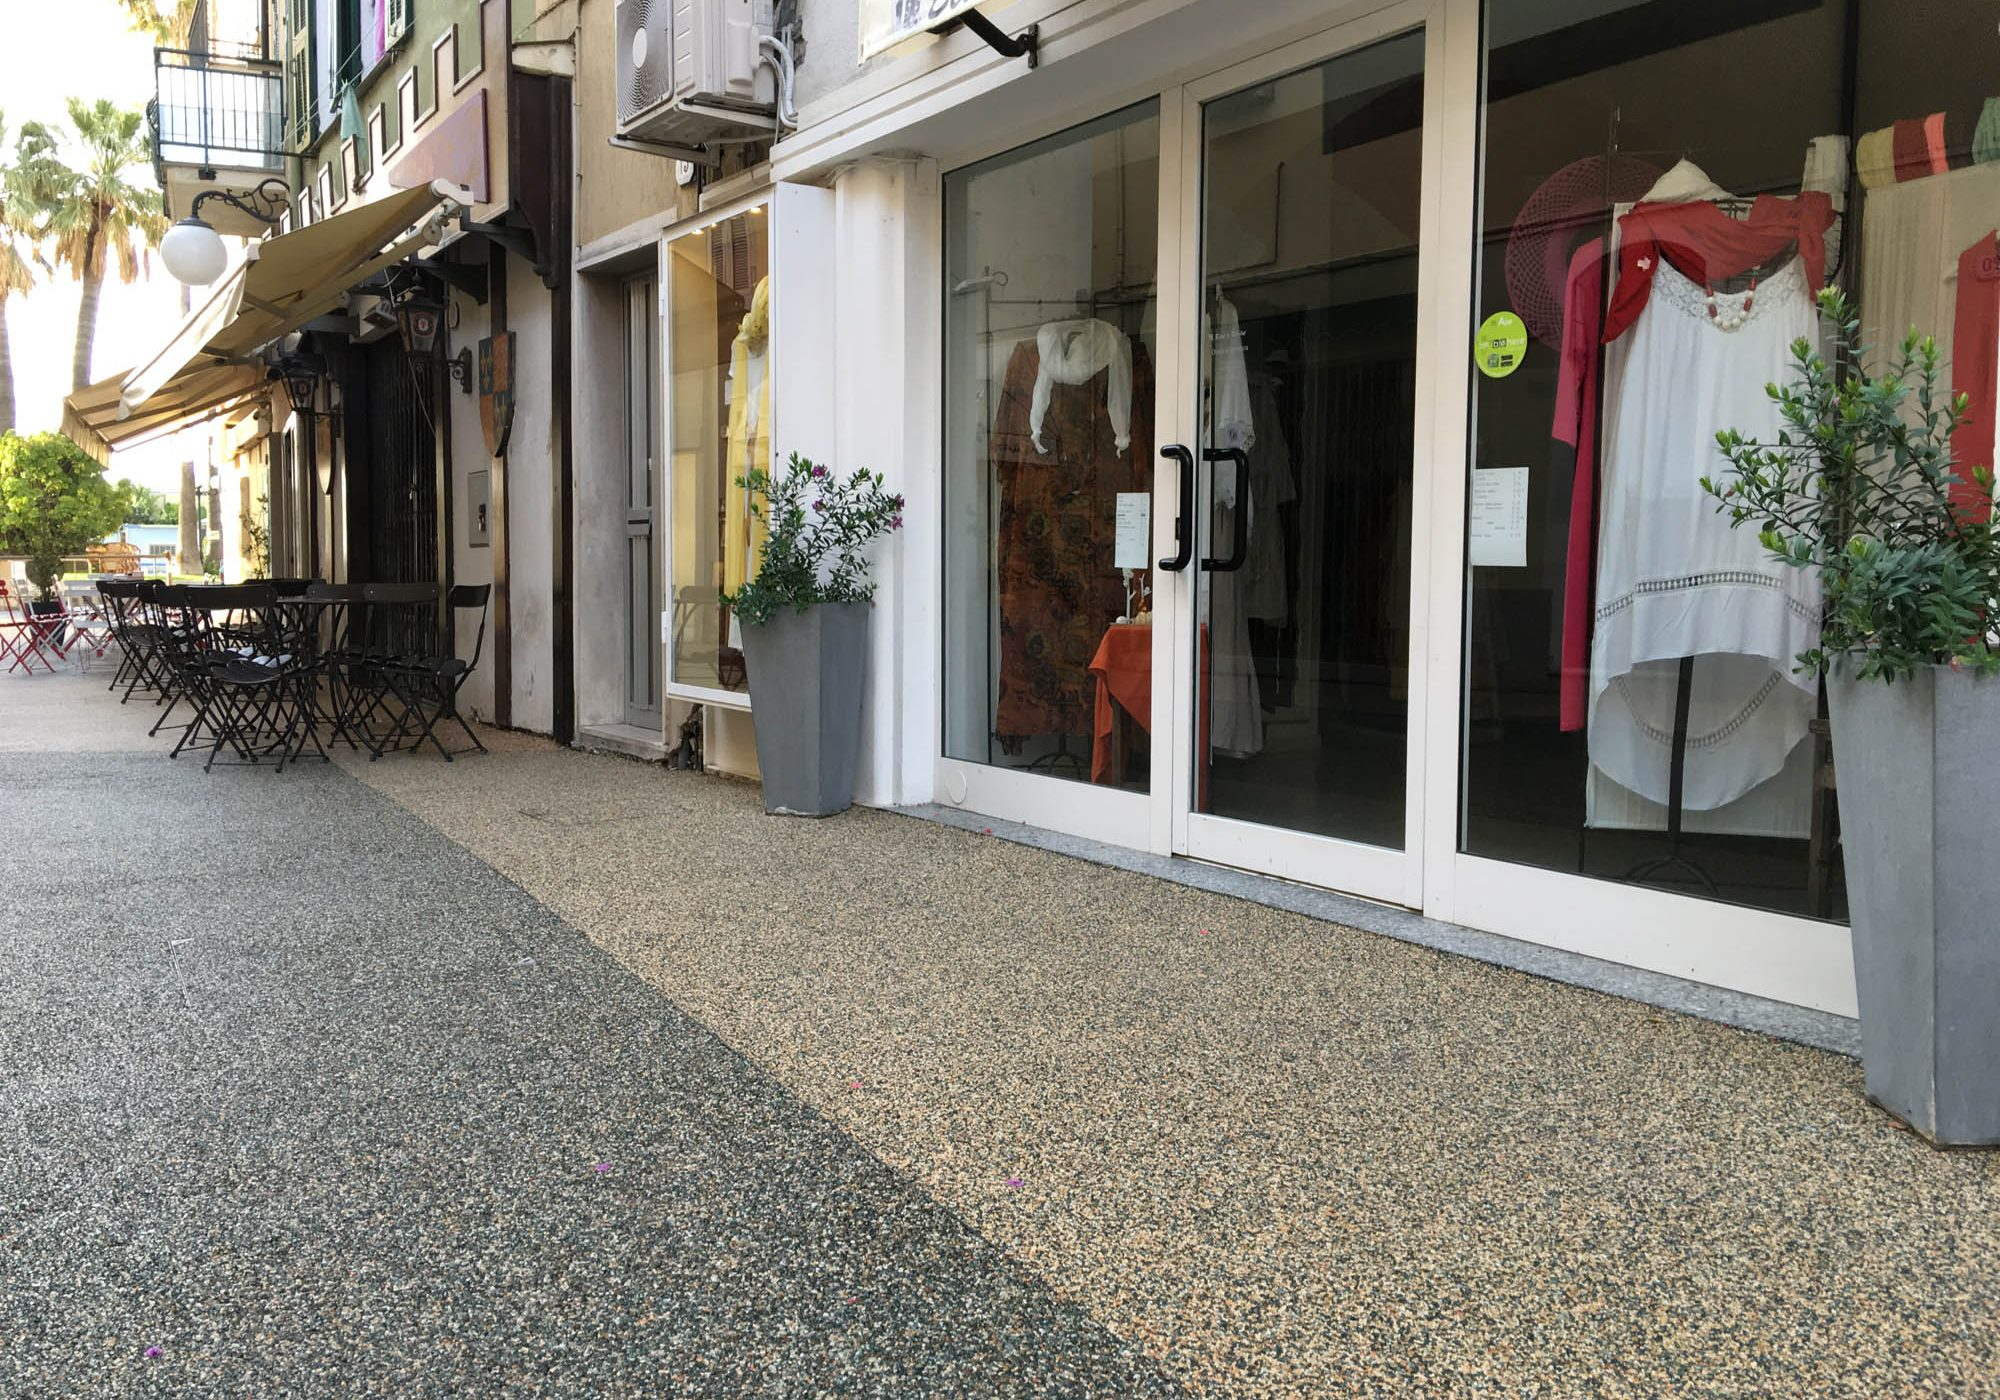 viale-diano-marina_00008